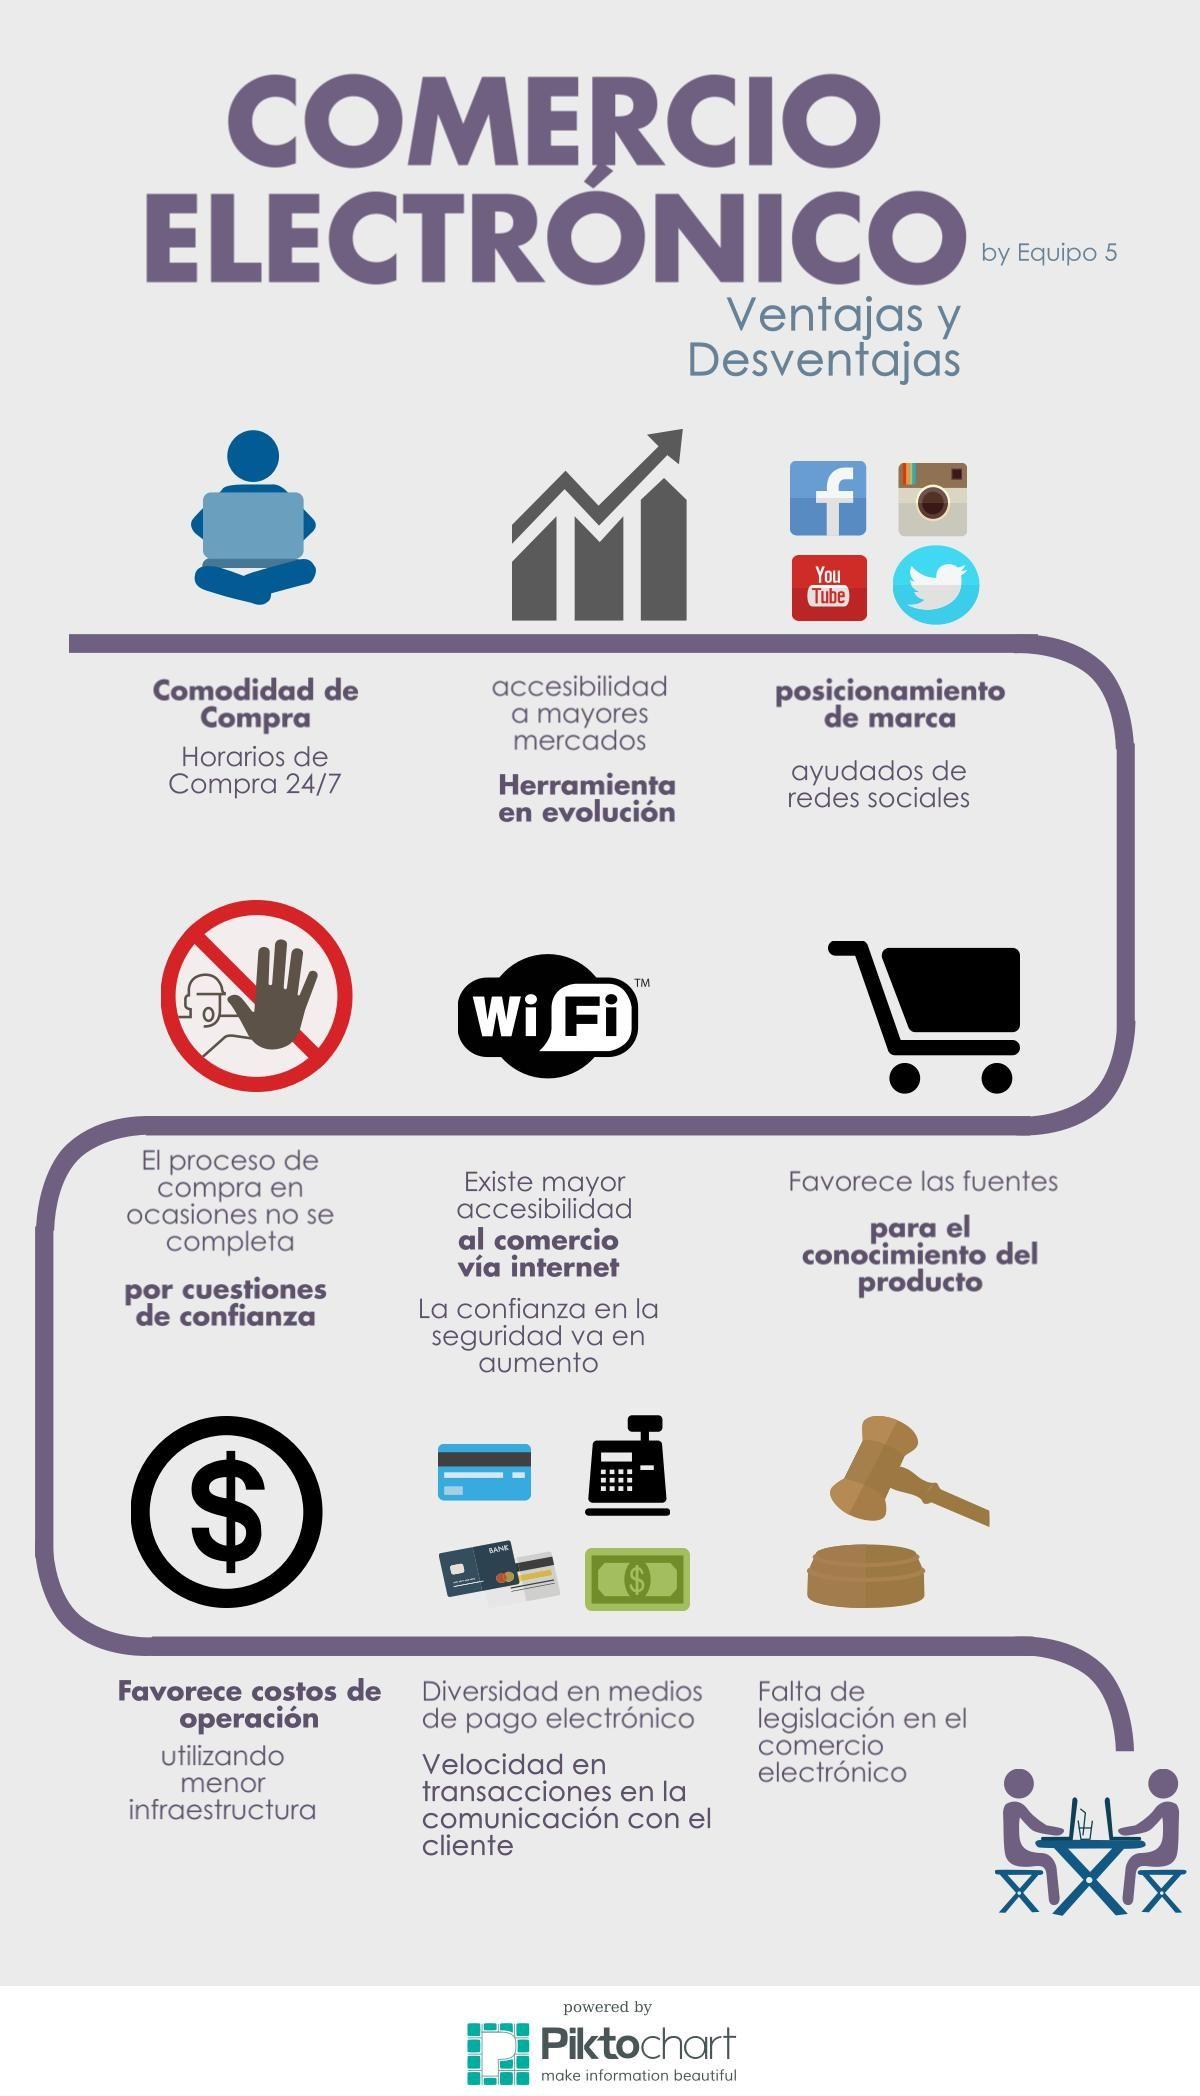 Infografia Comercio Electronico Equipo 5 Morales Peralta